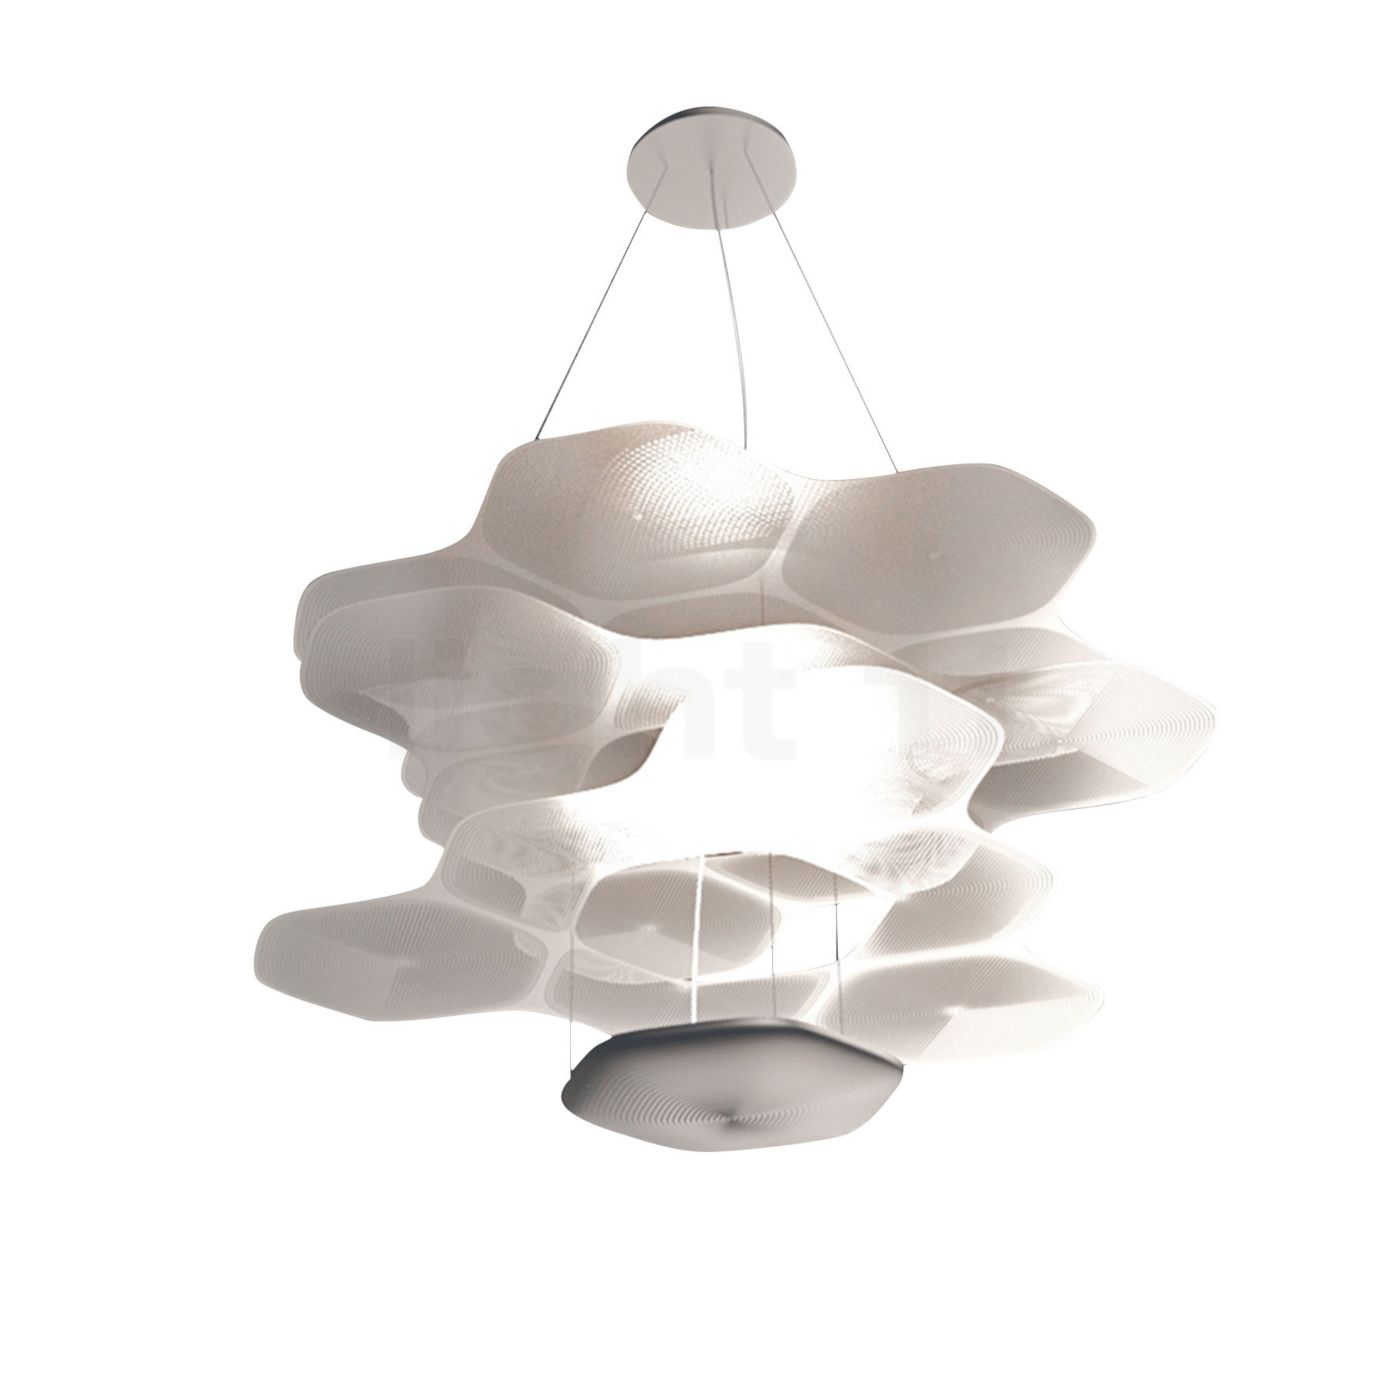 by pendant in situ creations furniture light aqua mimosa ceiling cloud